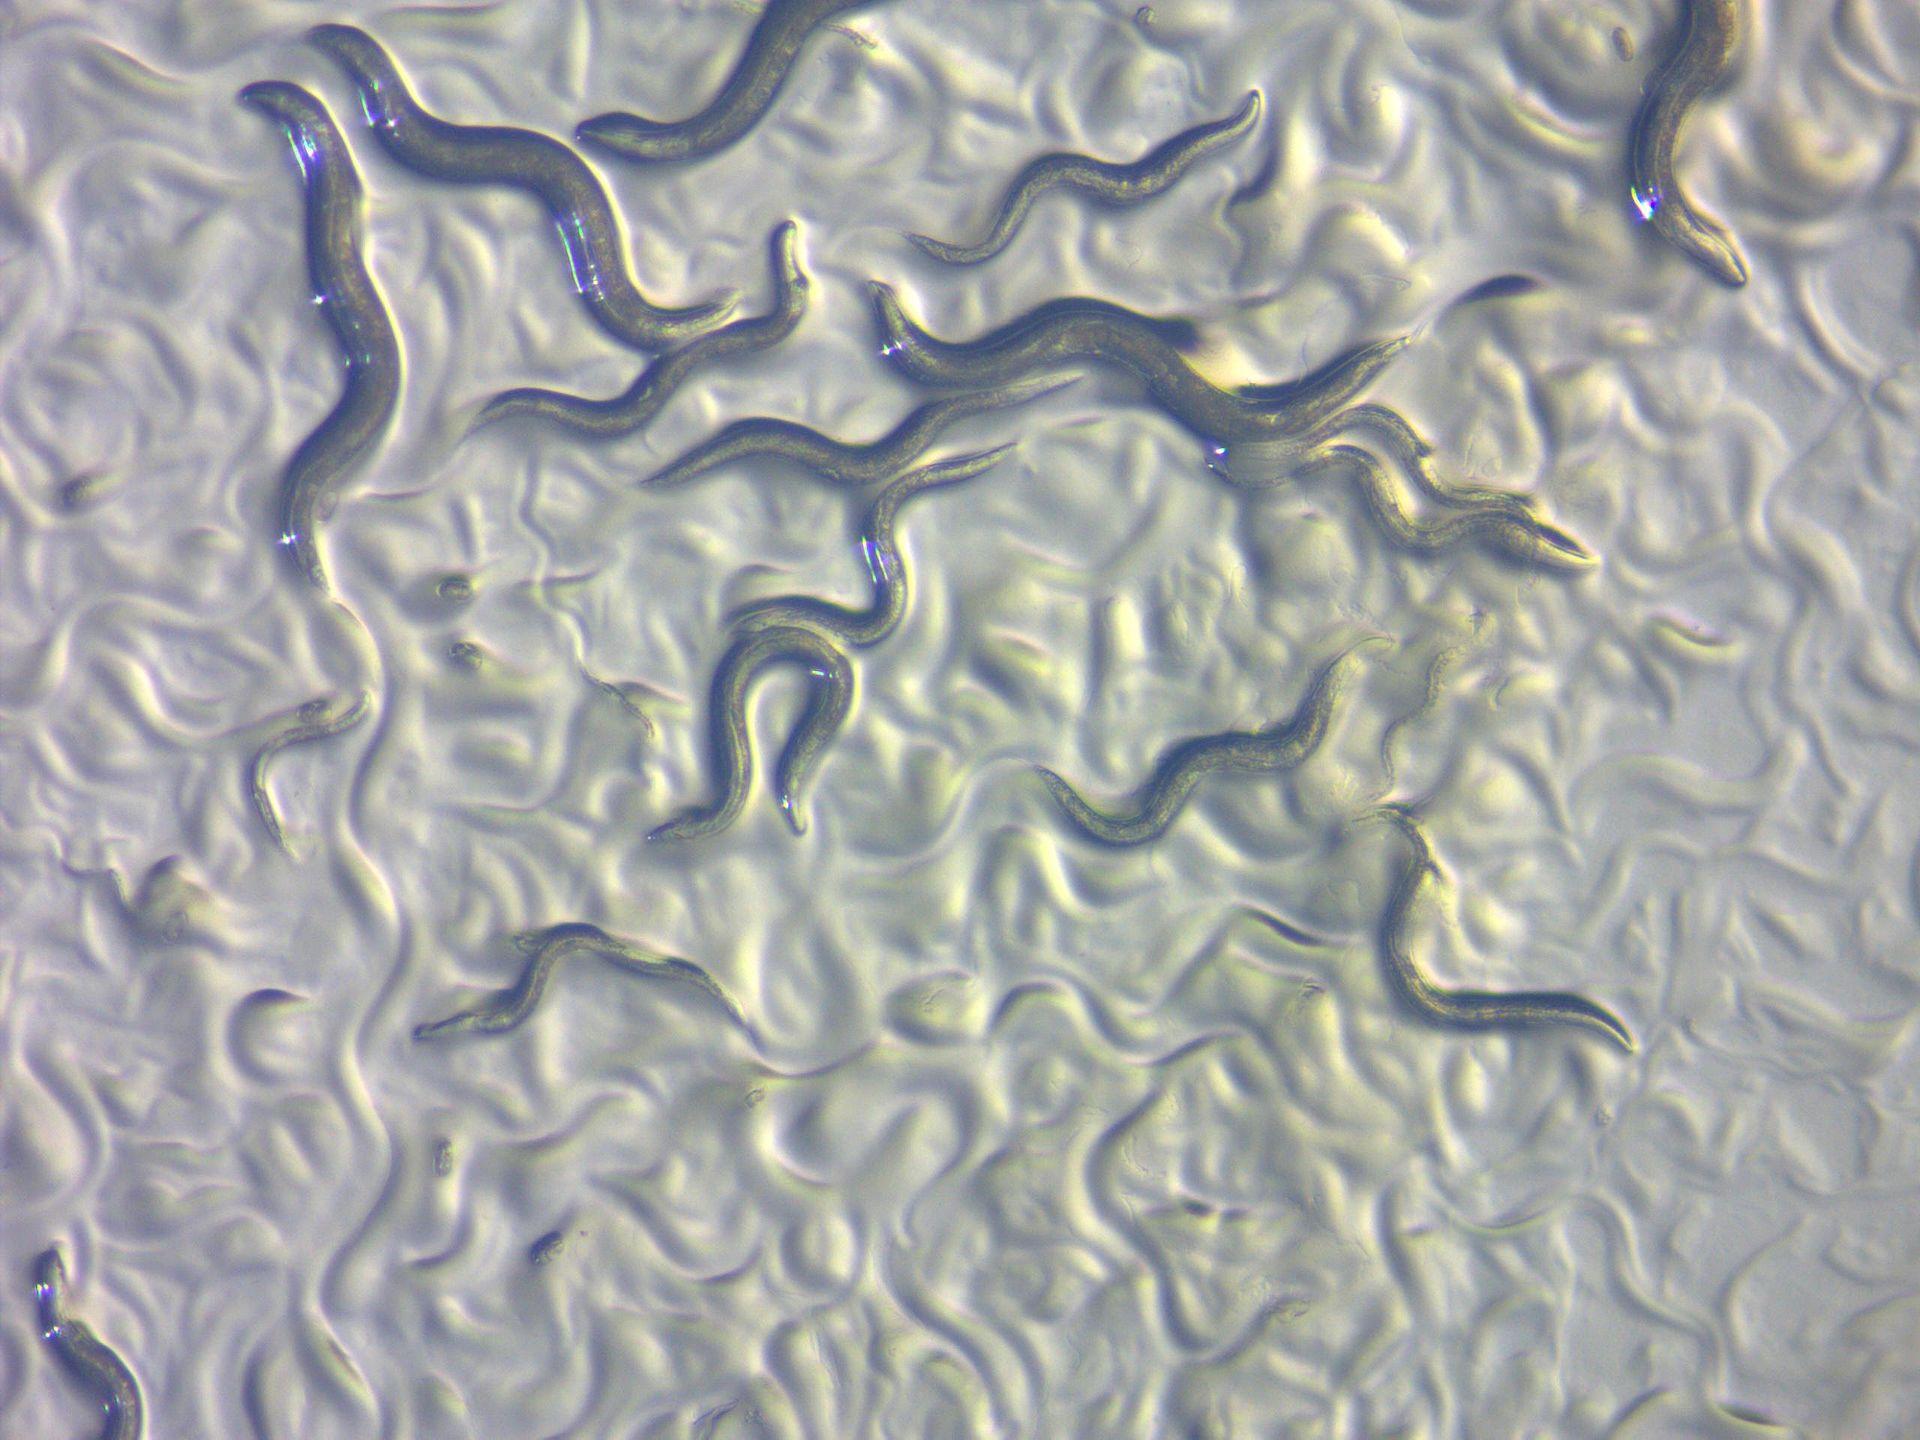 C.elegan worms. Photo courtesy of ZEISS Microscopy Germany/Creative Commons.